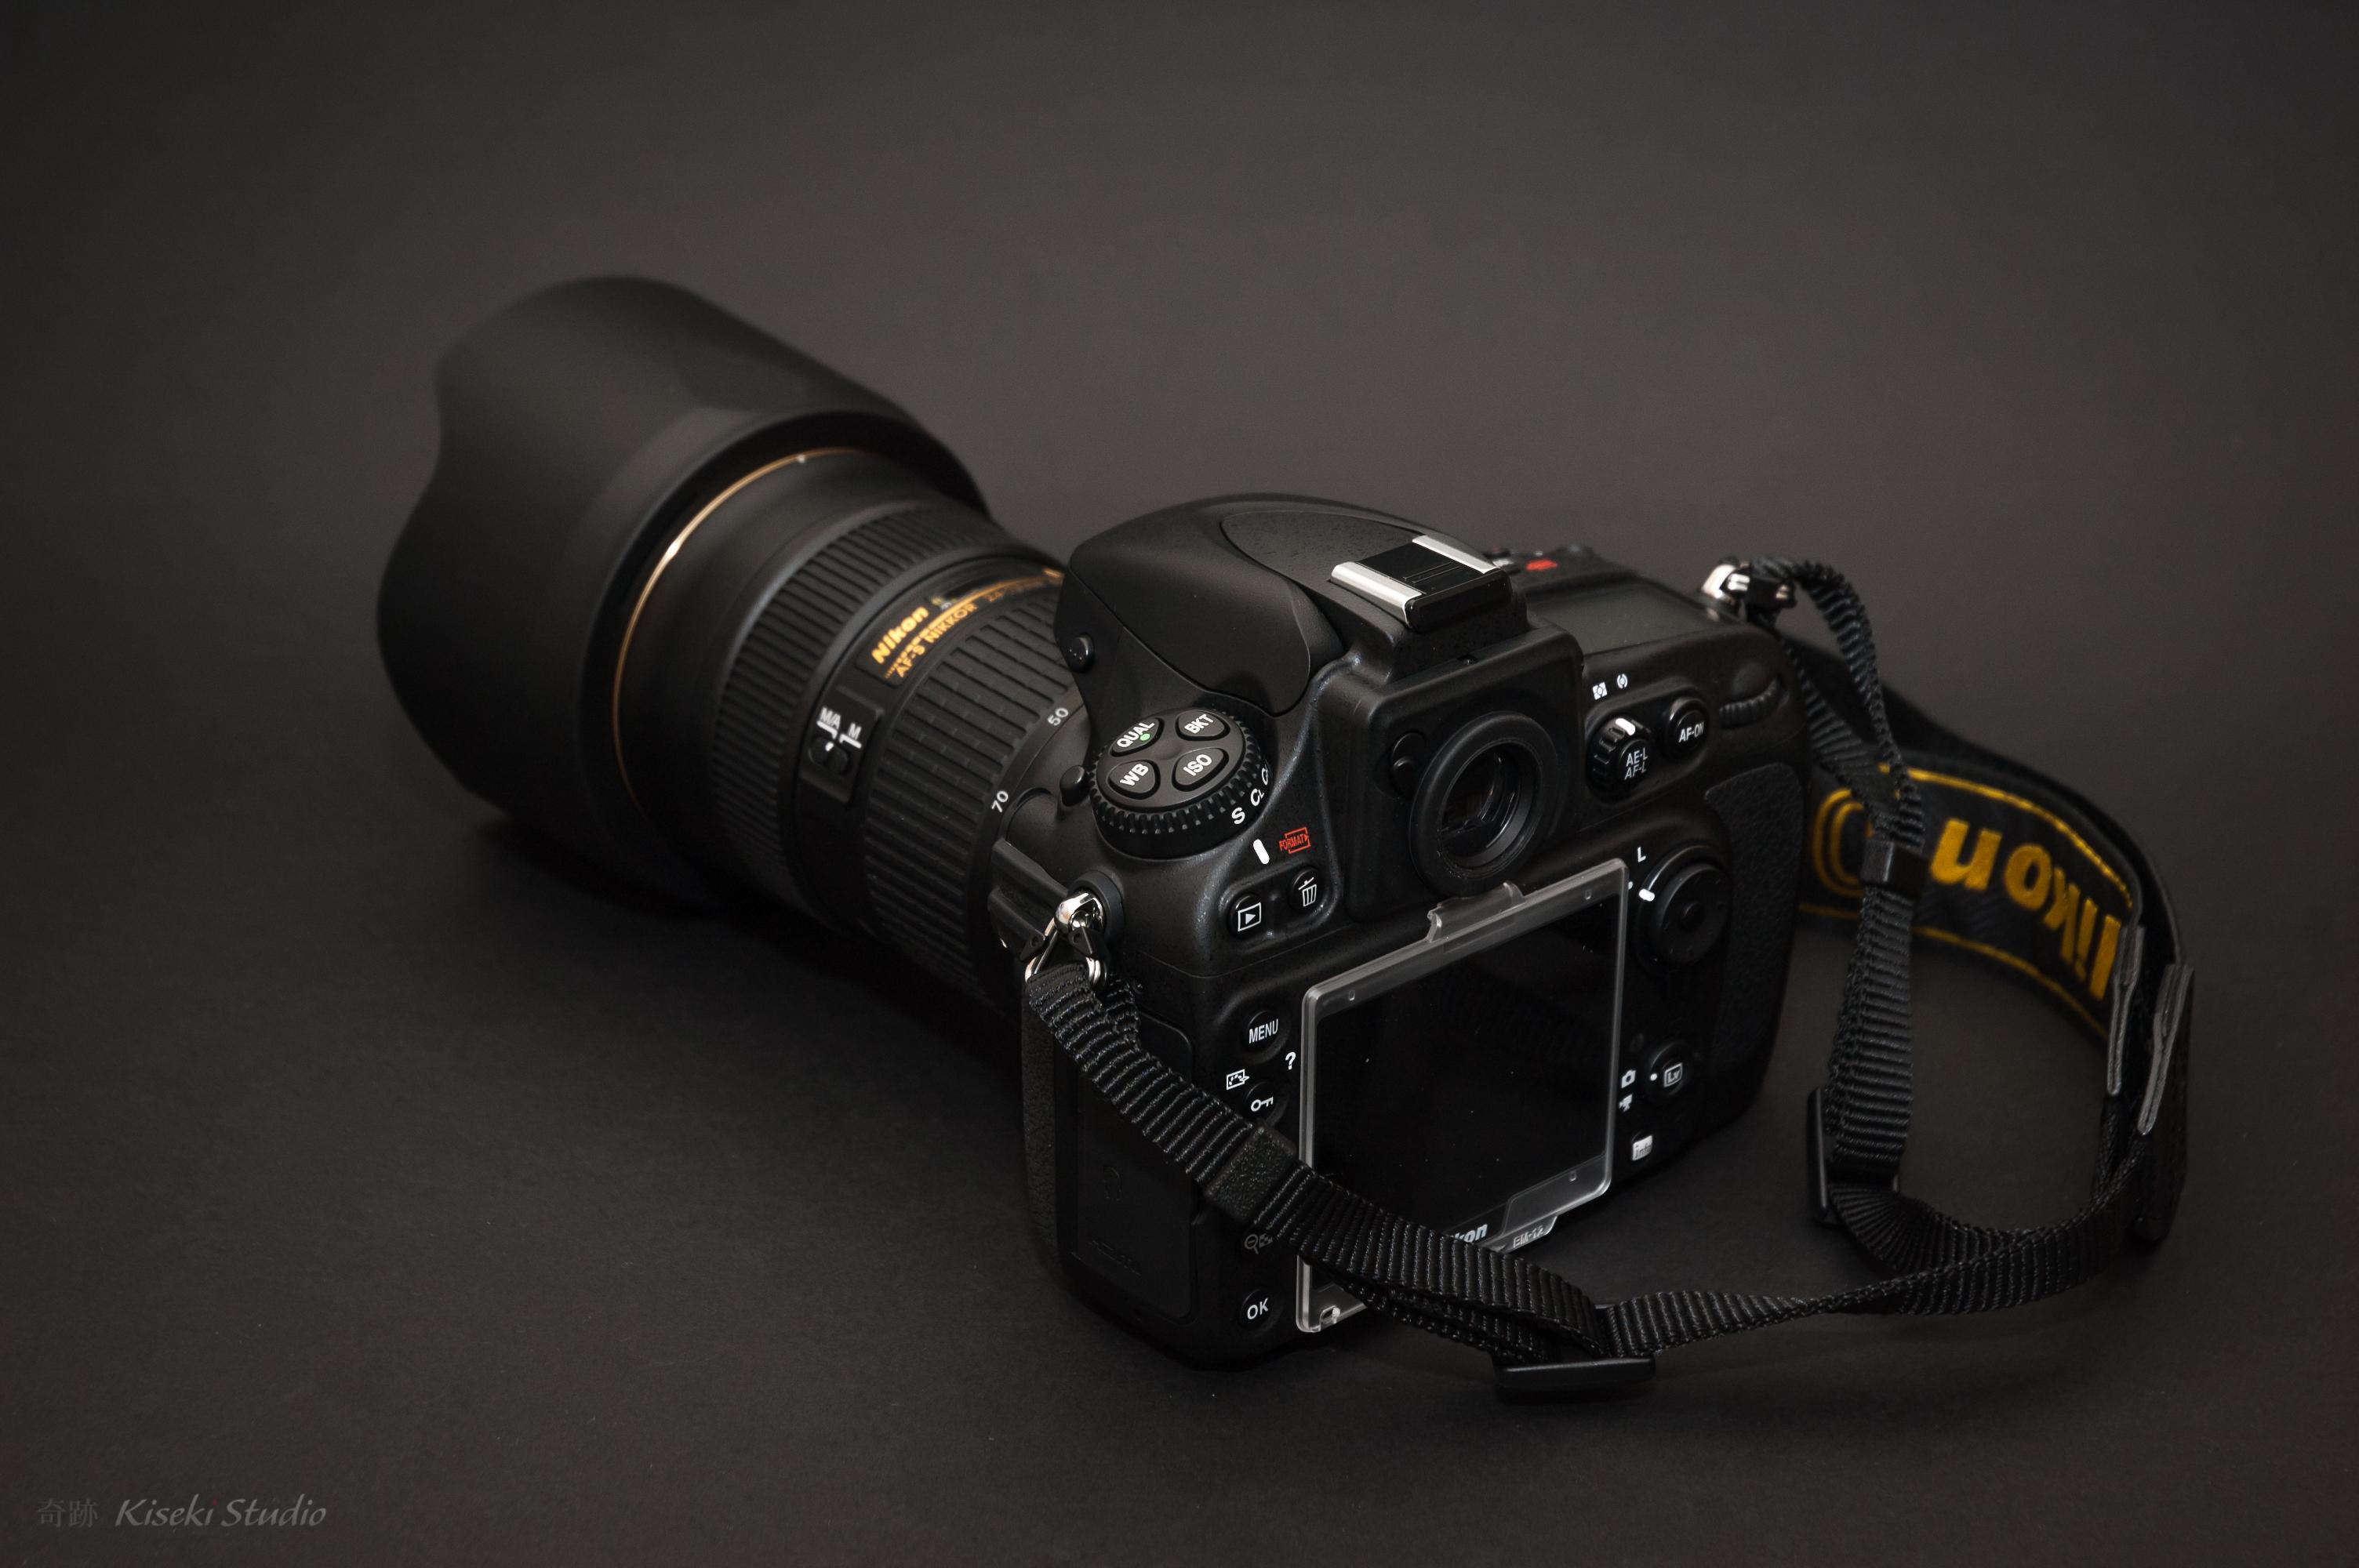 New equipment nikon d800 amp nikon af s 24 70mm 2 8g ed kiseki